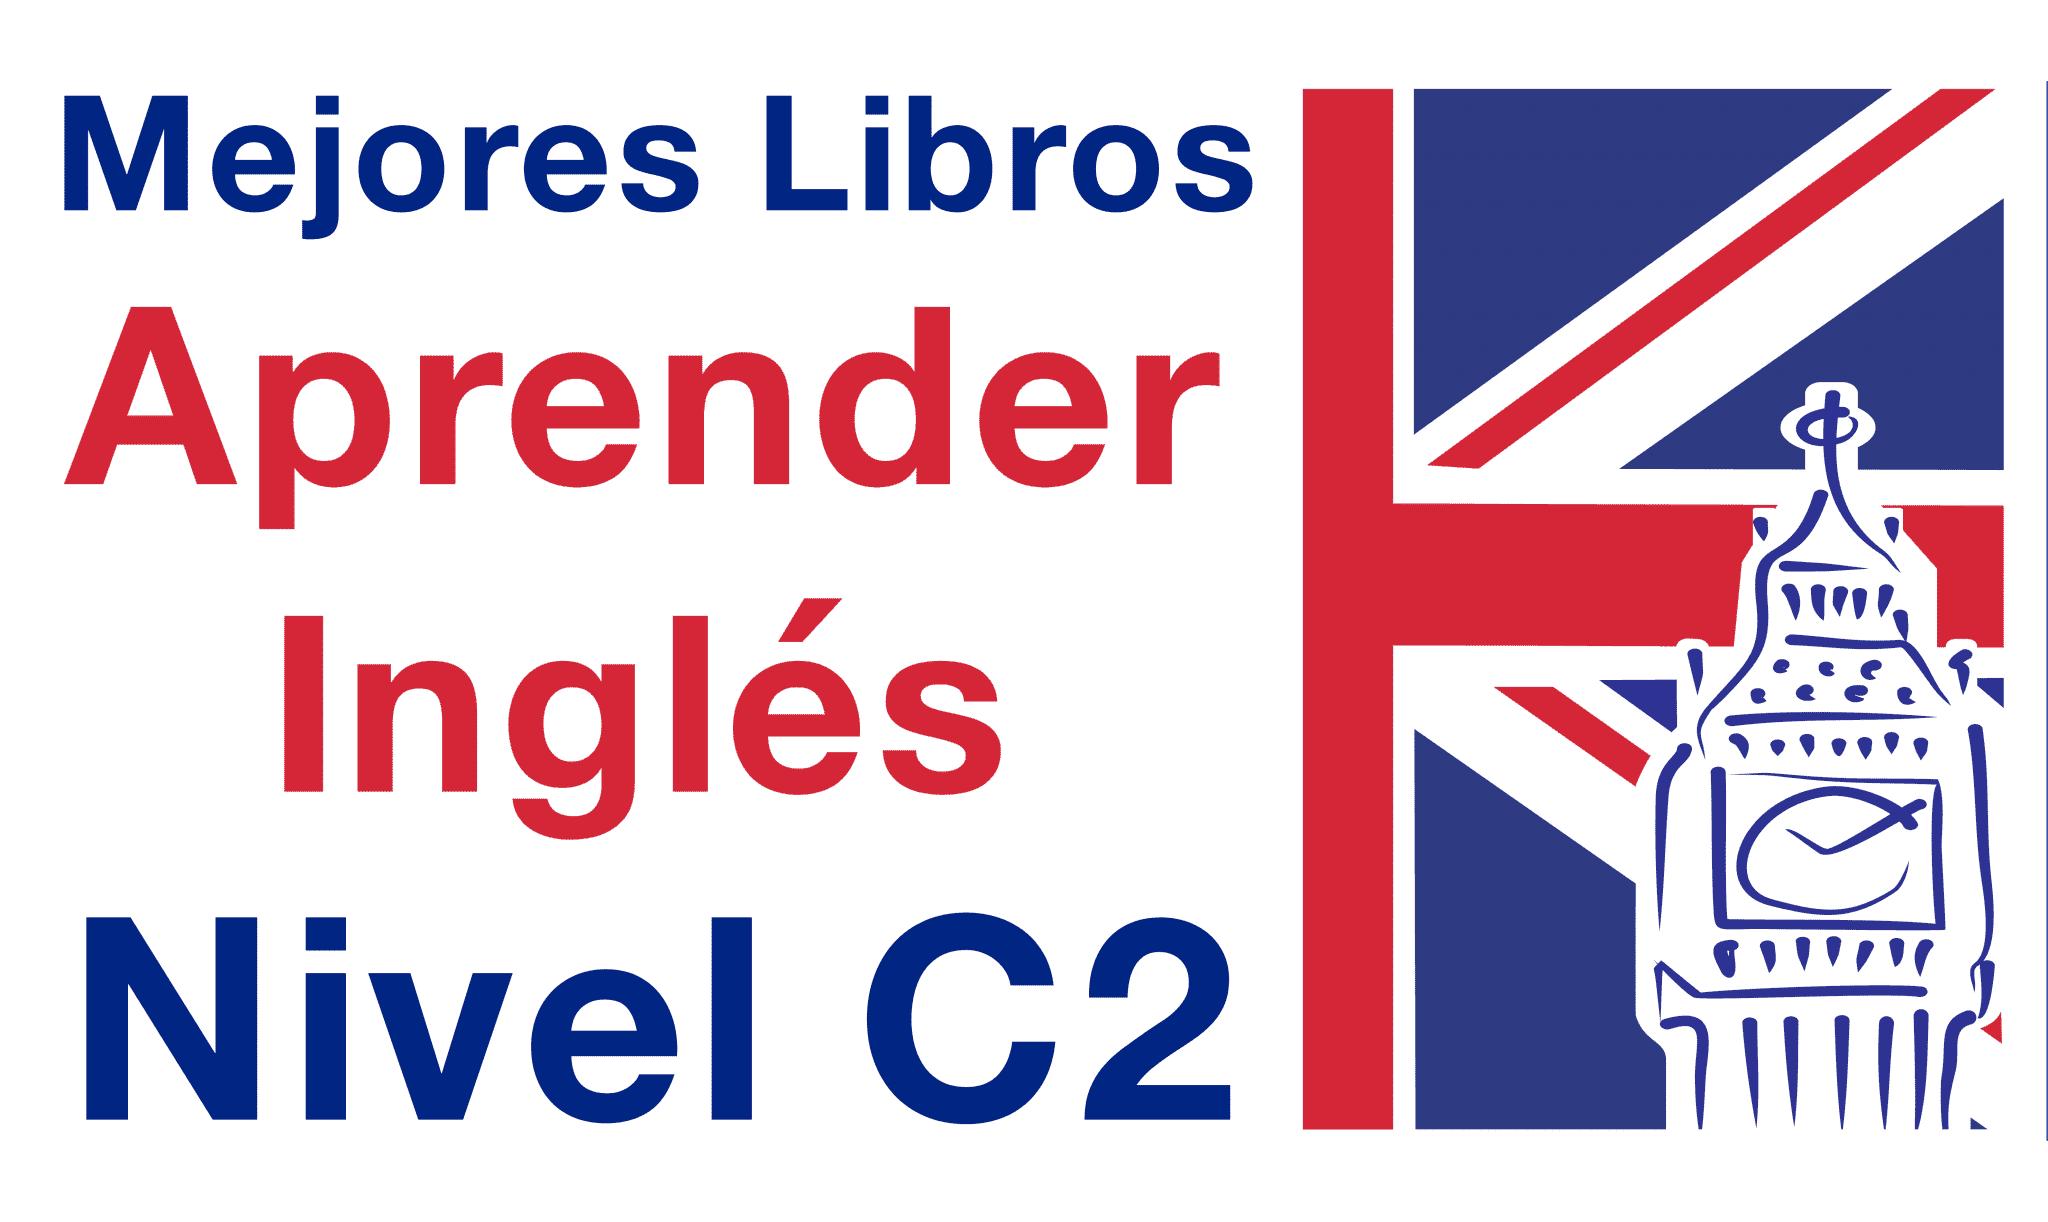 Aprender ingl s nivel c2 los mejores libros para nivel c2 for Tiempo aprender ingles